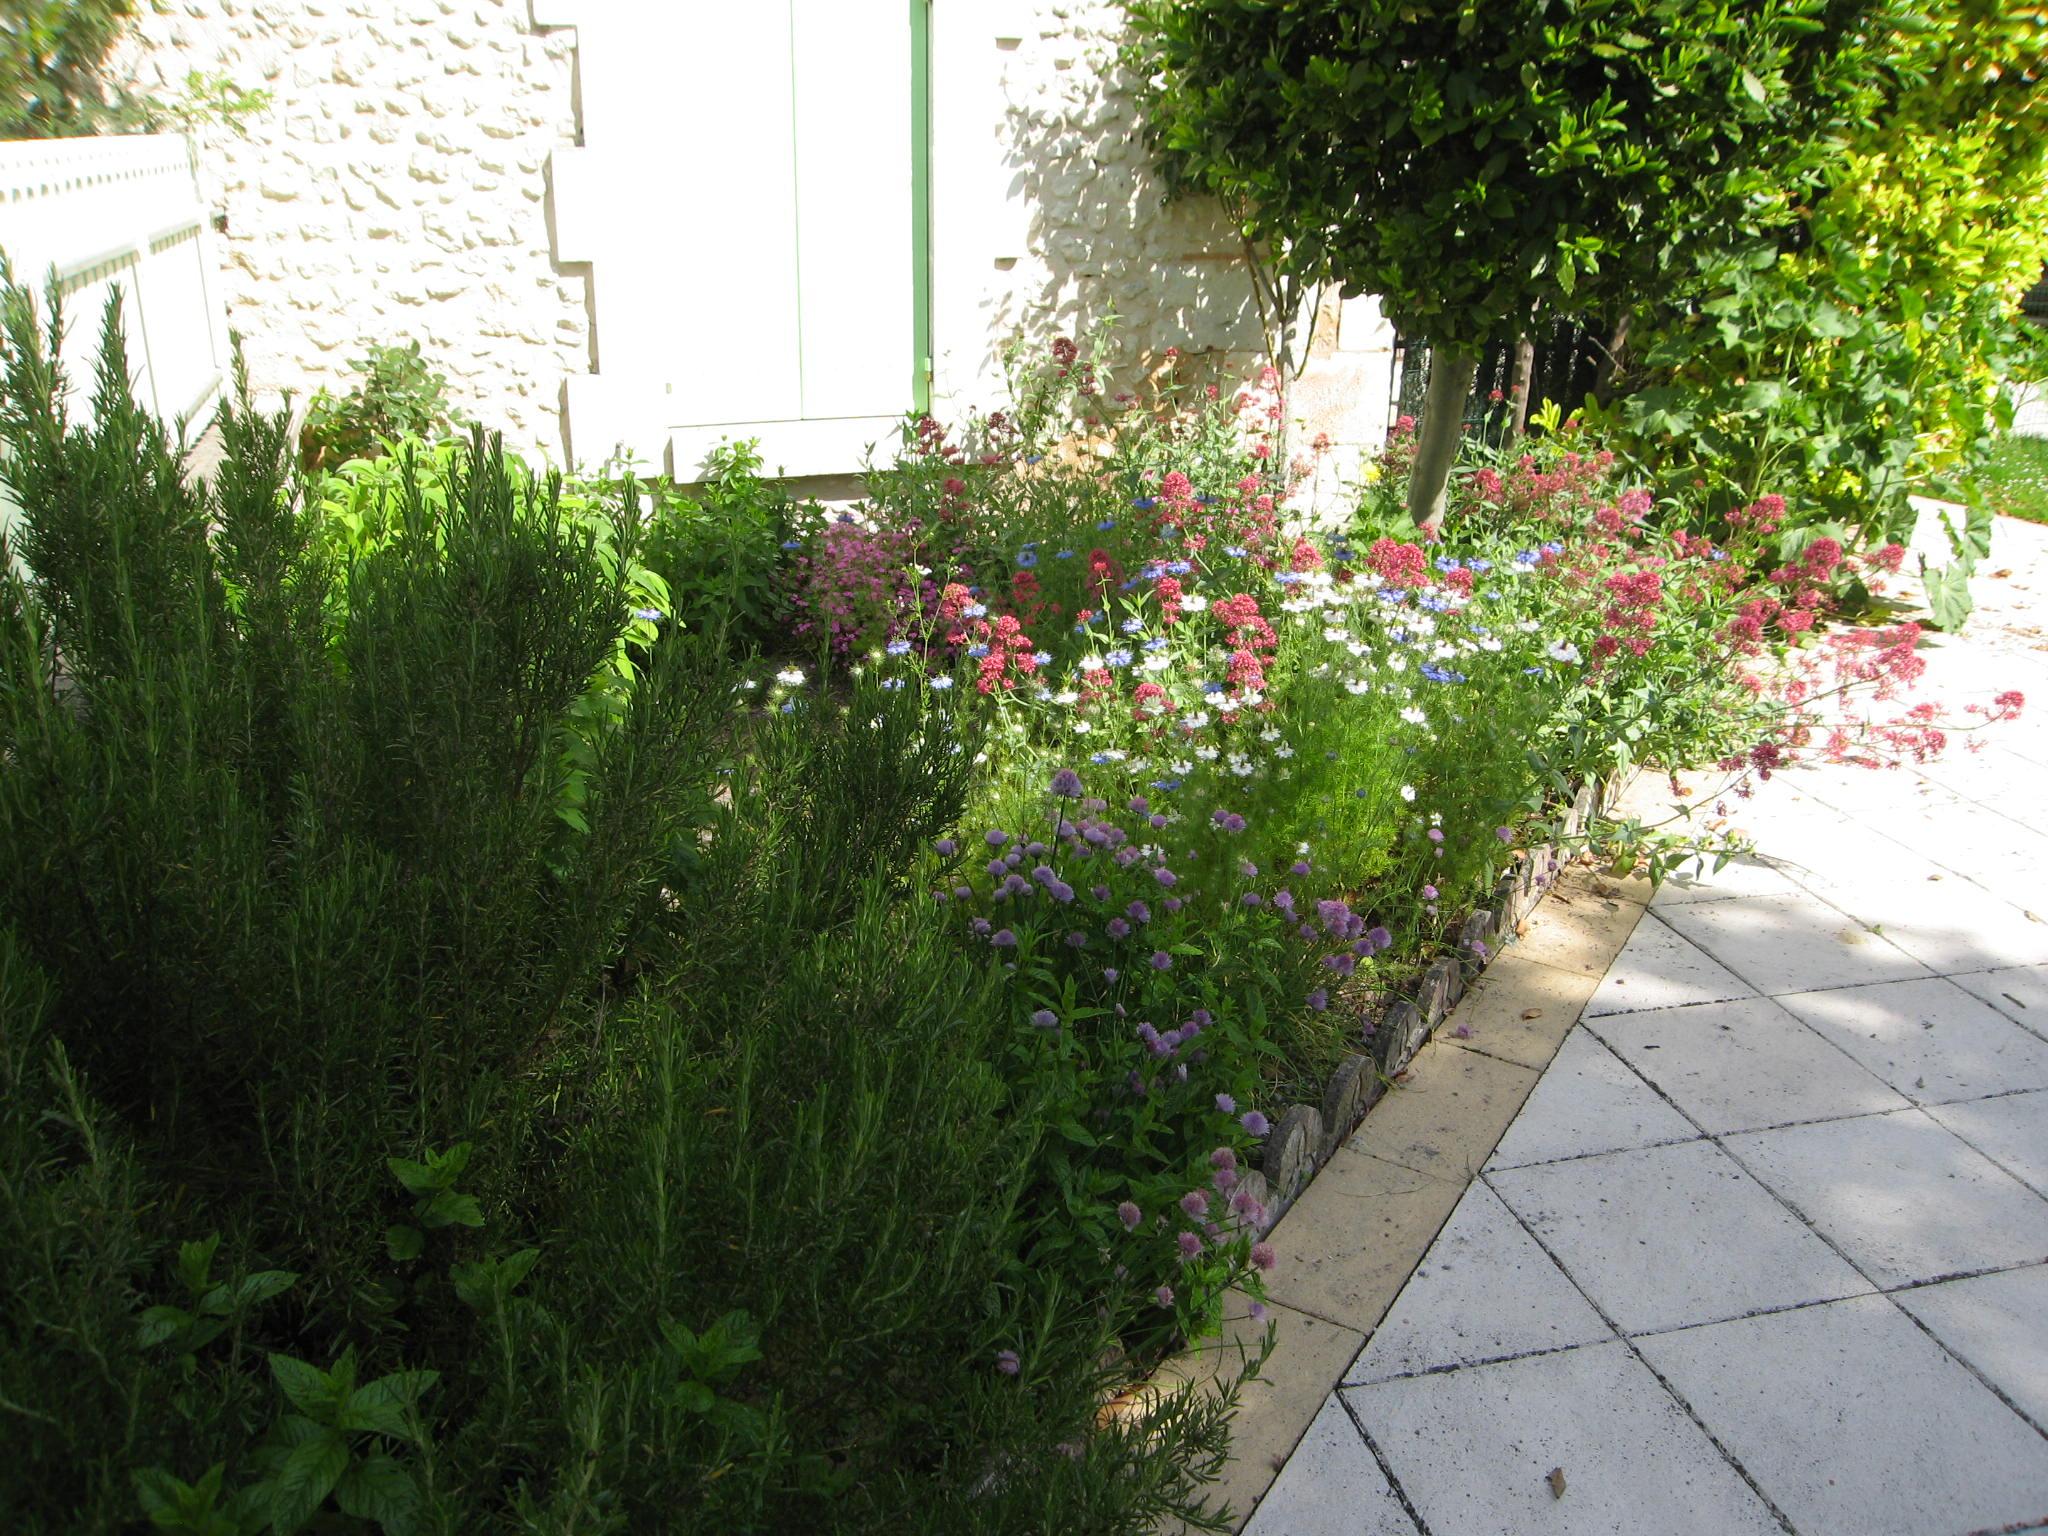 Le mini jardin d'aromatiques